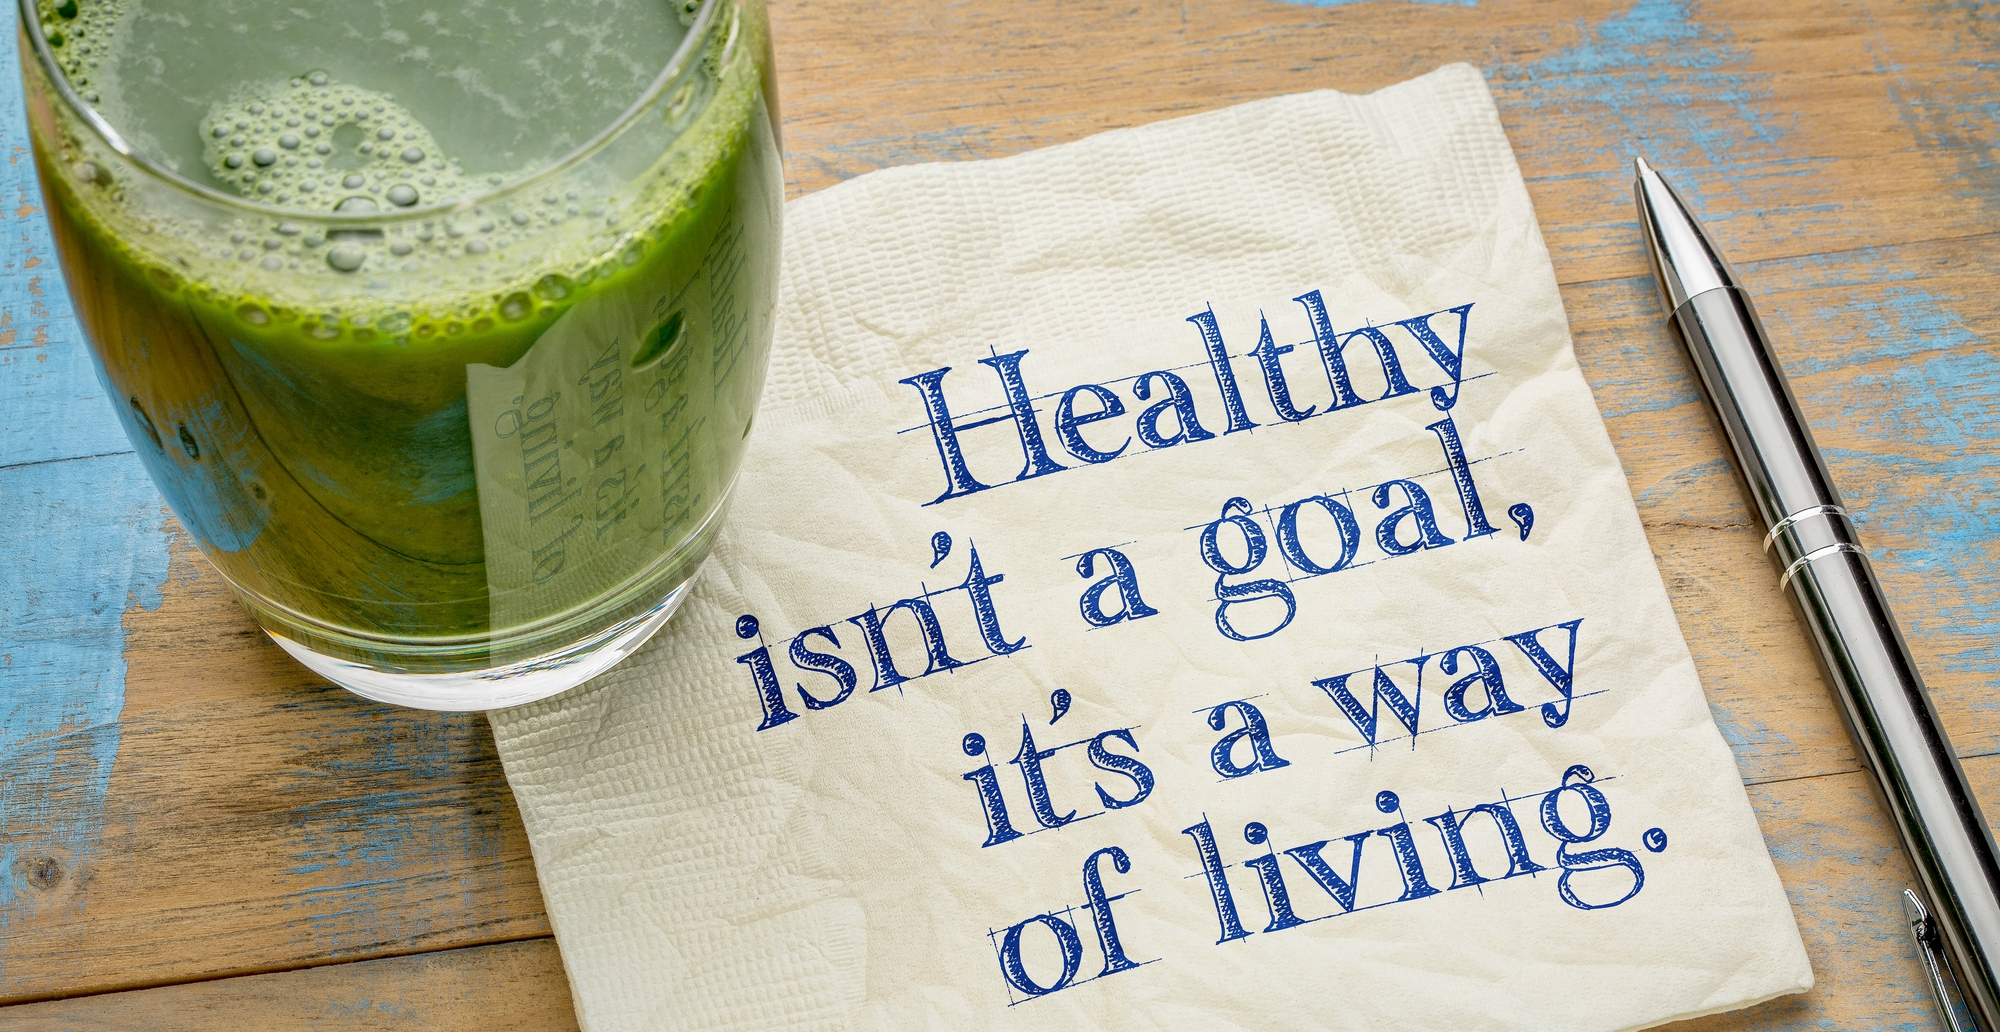 HEALTH CONSULT-AYURVEDA